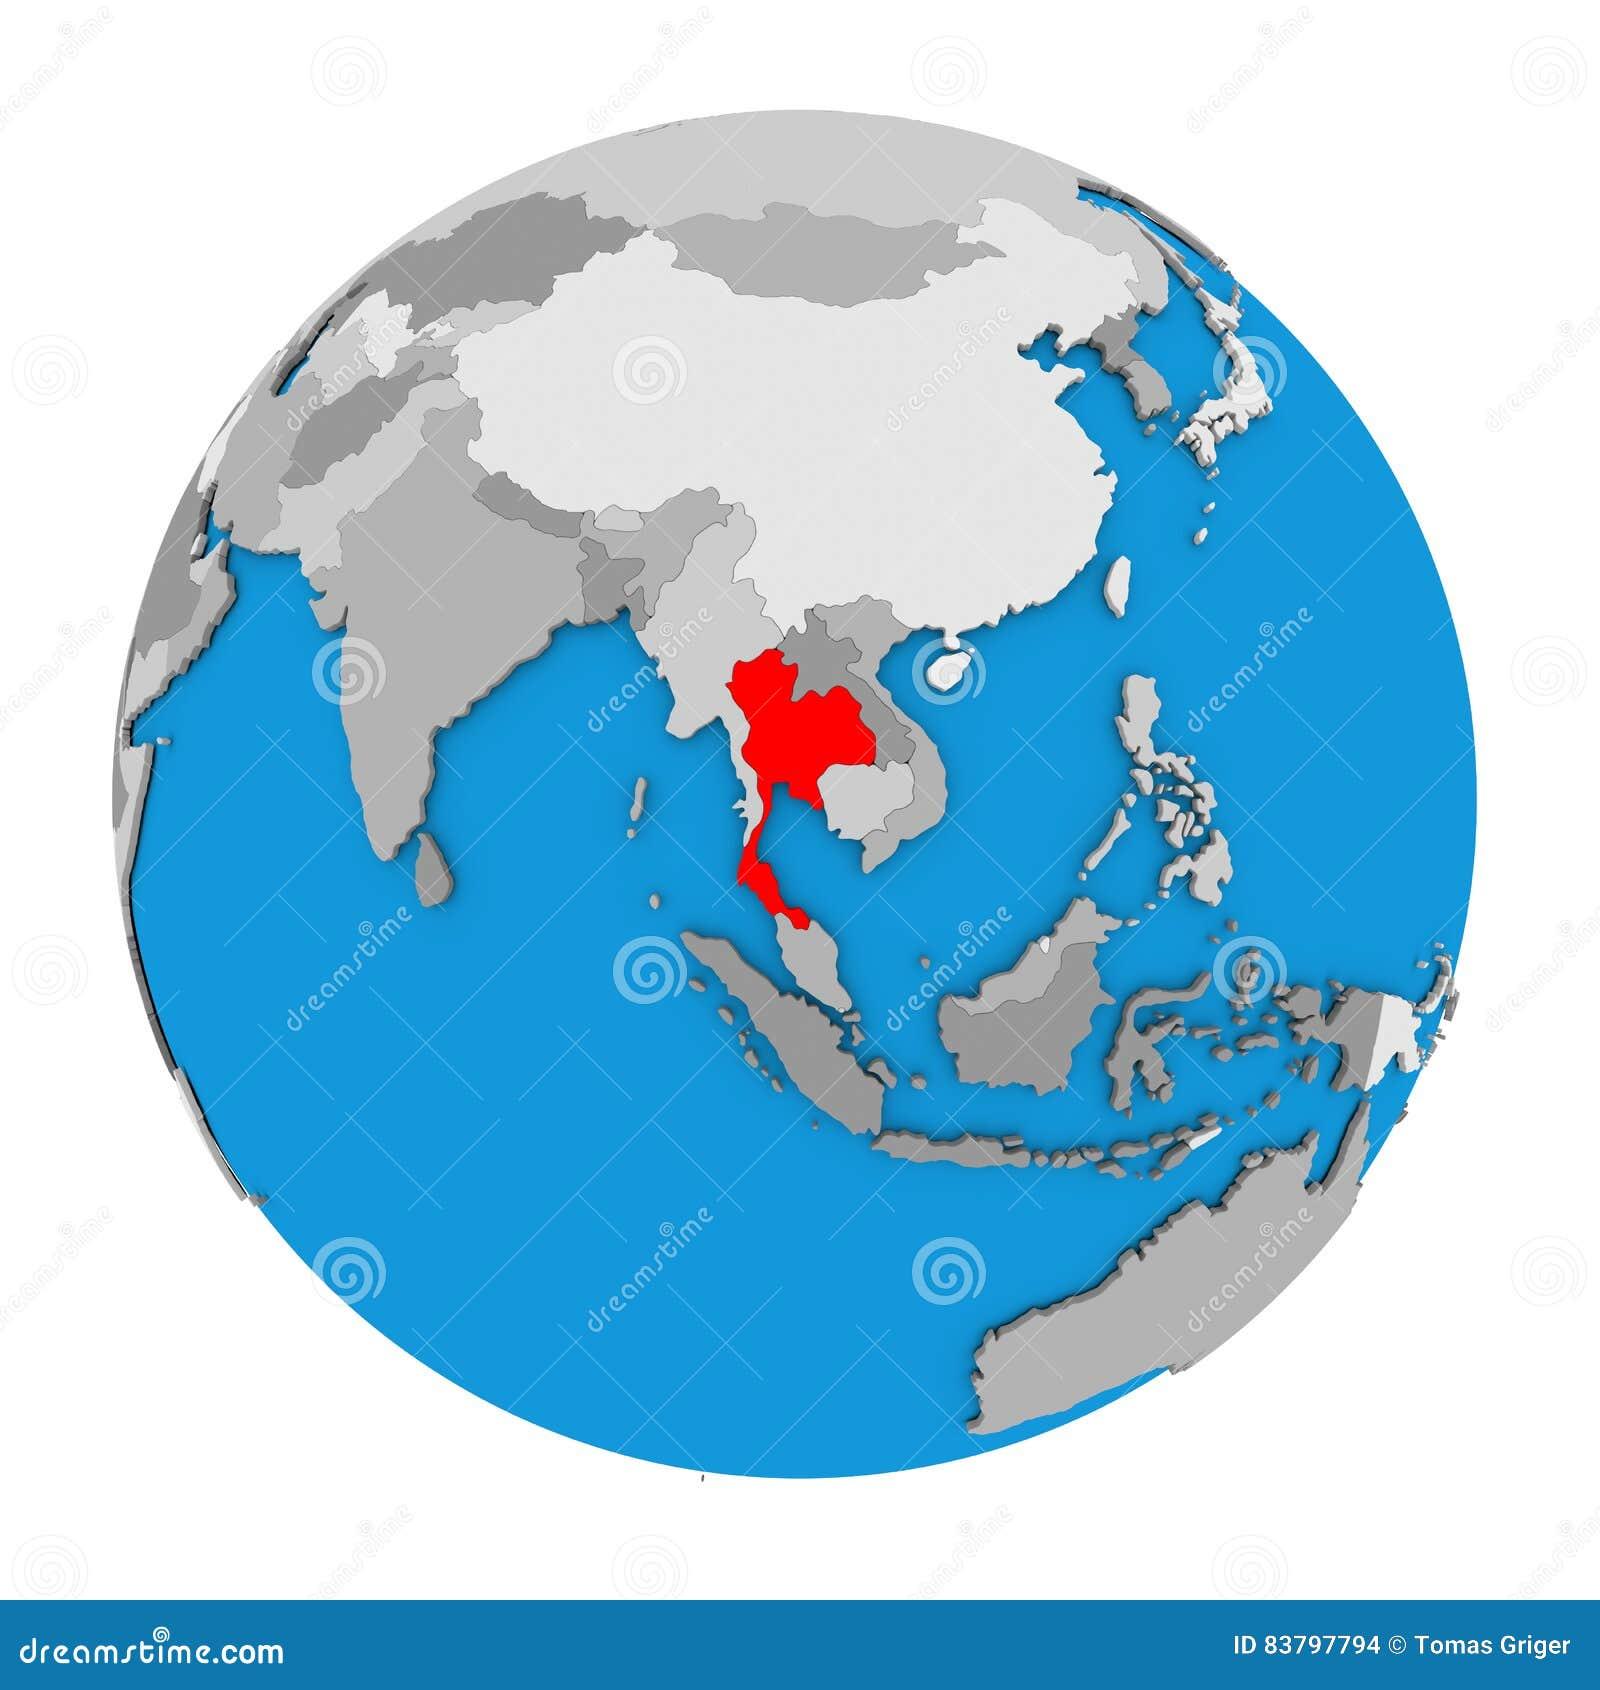 Thailand on globe stock illustration. Illustration of region - 83797794